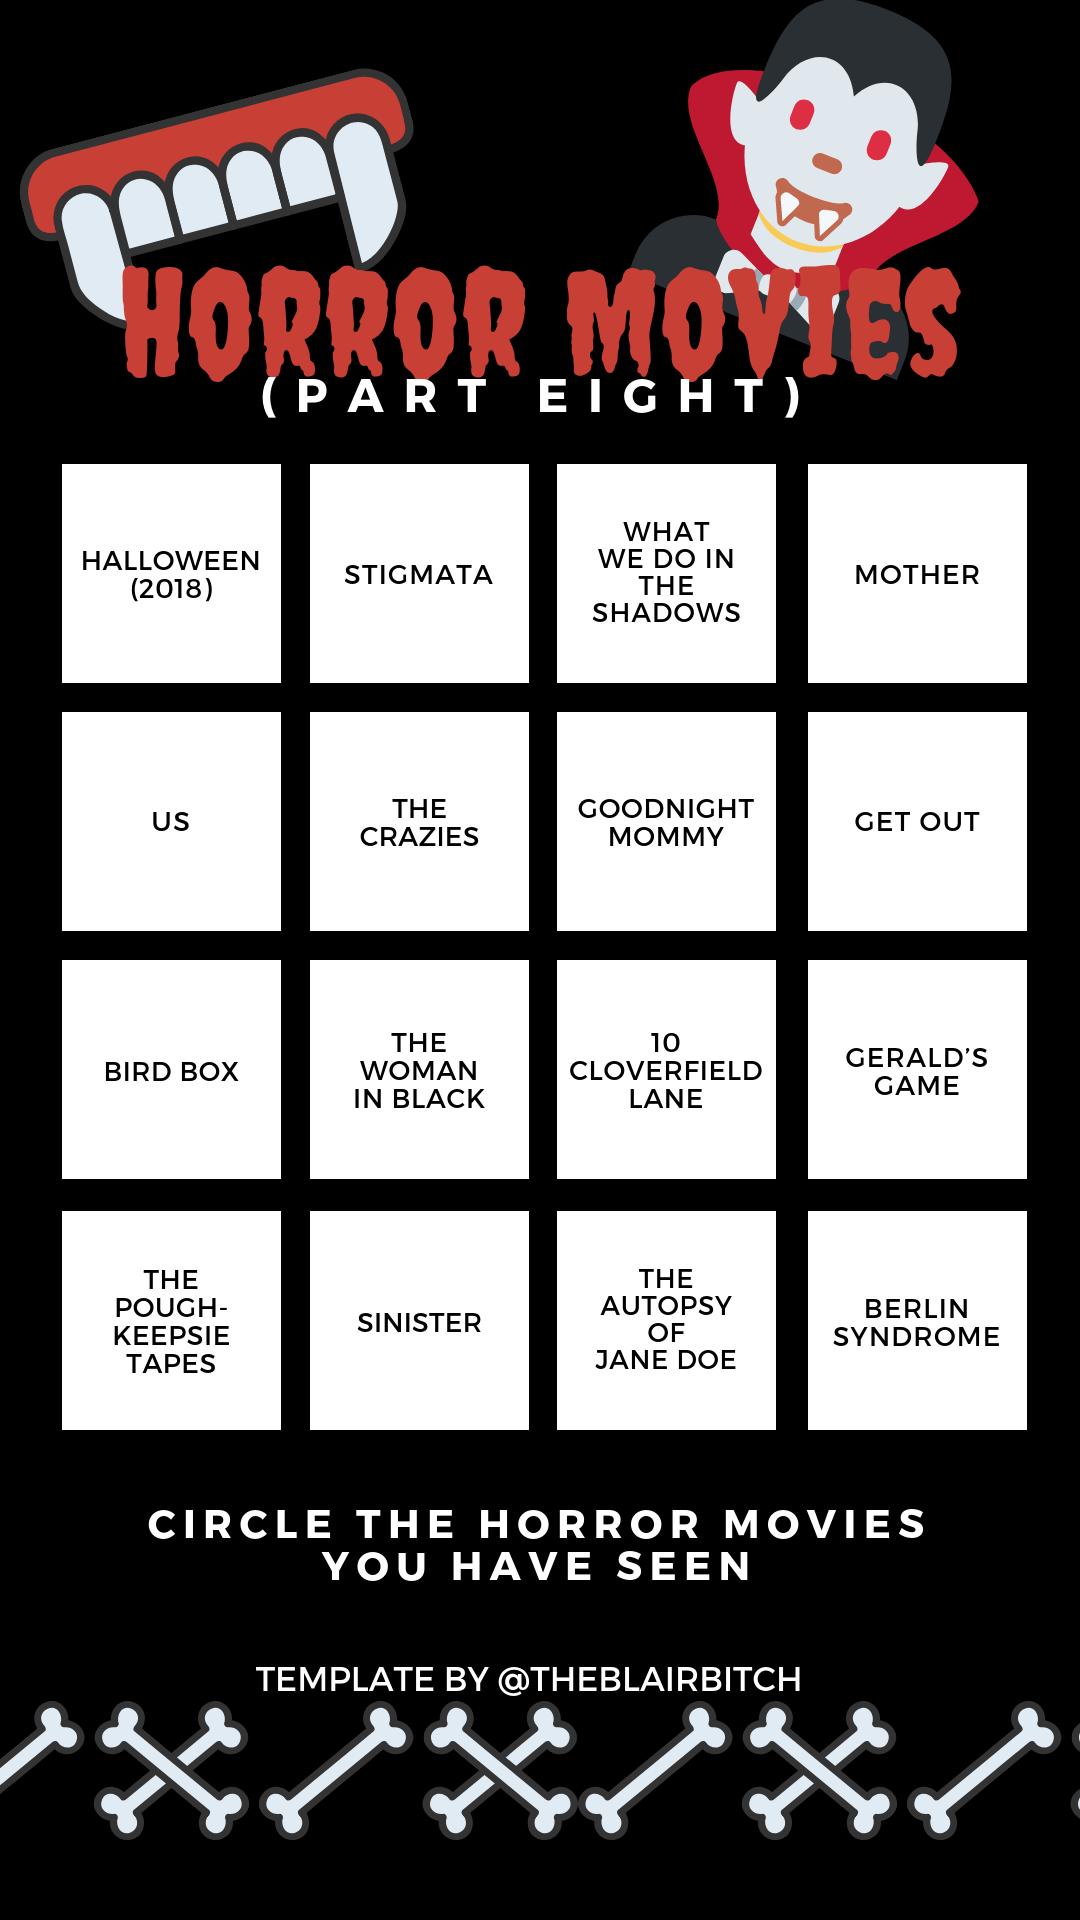 Horror Movie Bingo (Part Eight) Instagram Story Template